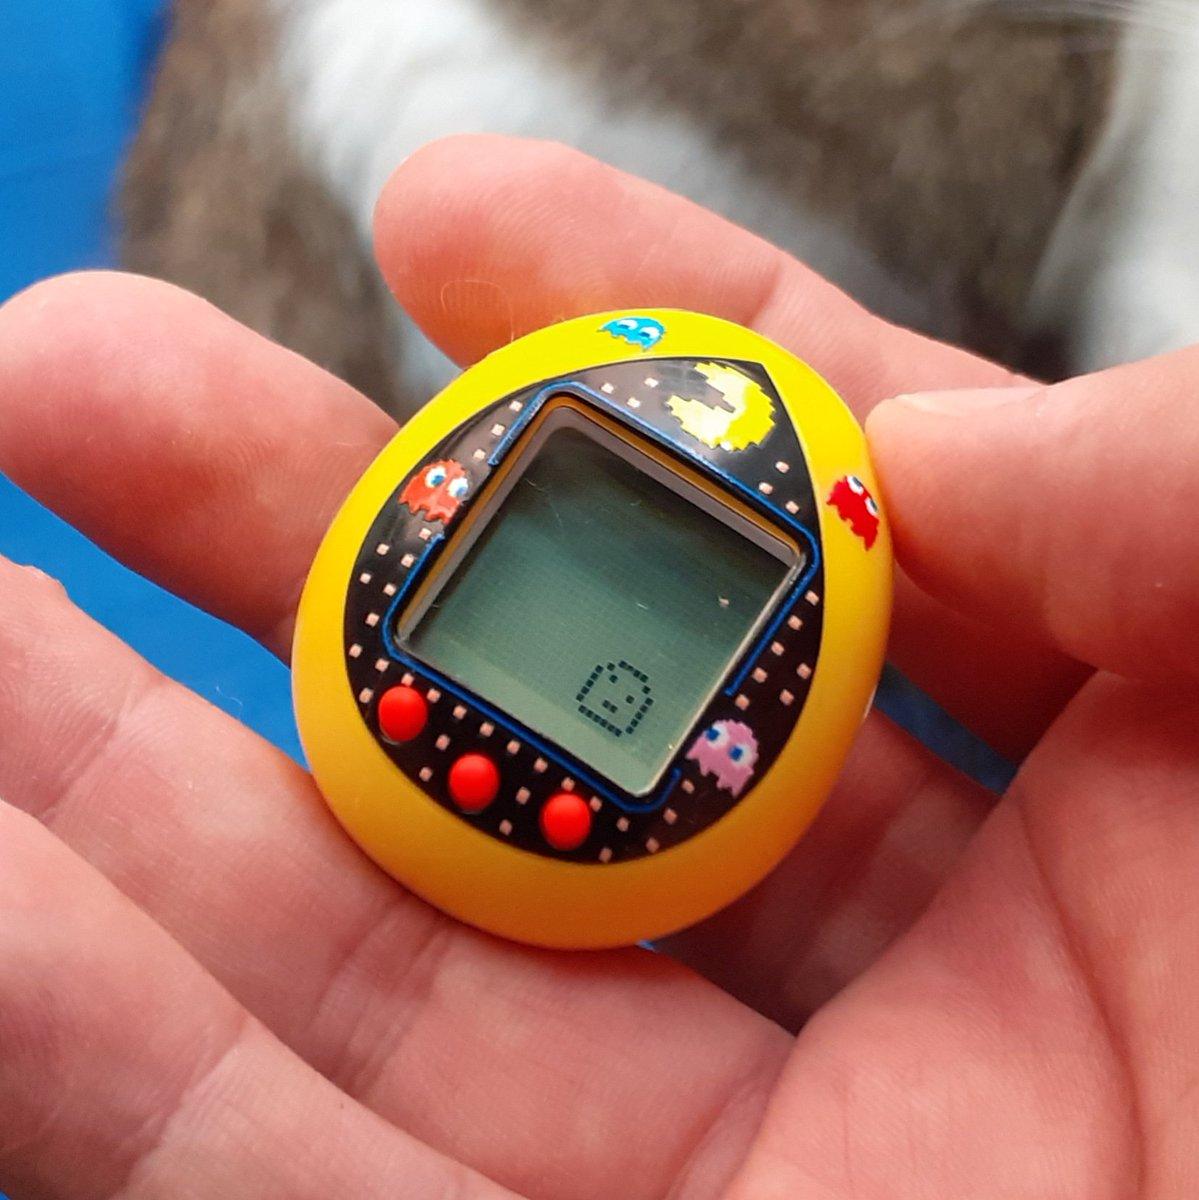 #Tamagotchi + #PacMan ? Pacmangotchi!! https://t.co/o3ql59M4iO